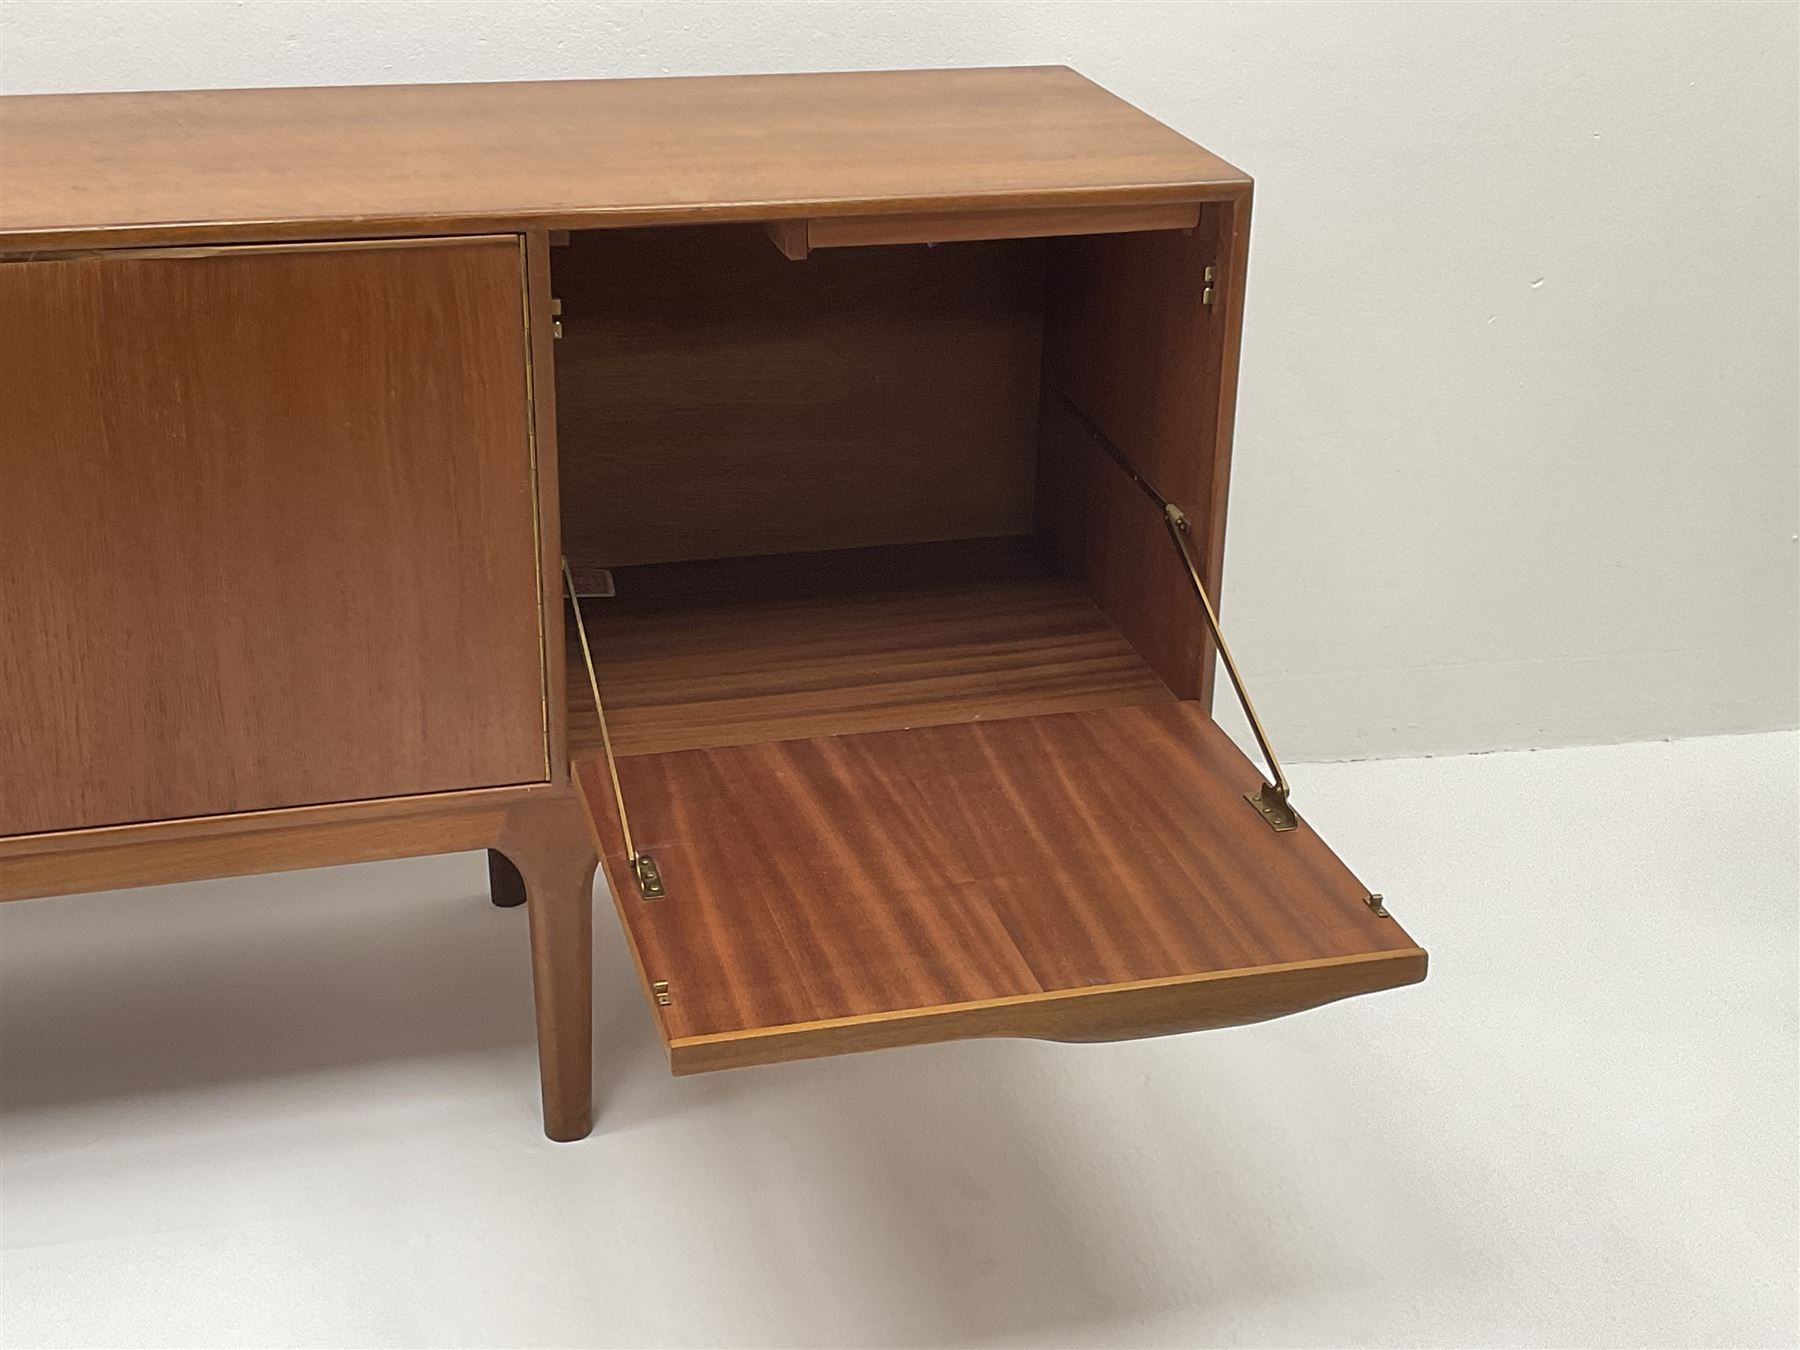 Mid 20th century A.H.McIntosh teak sideboard - Image 4 of 7